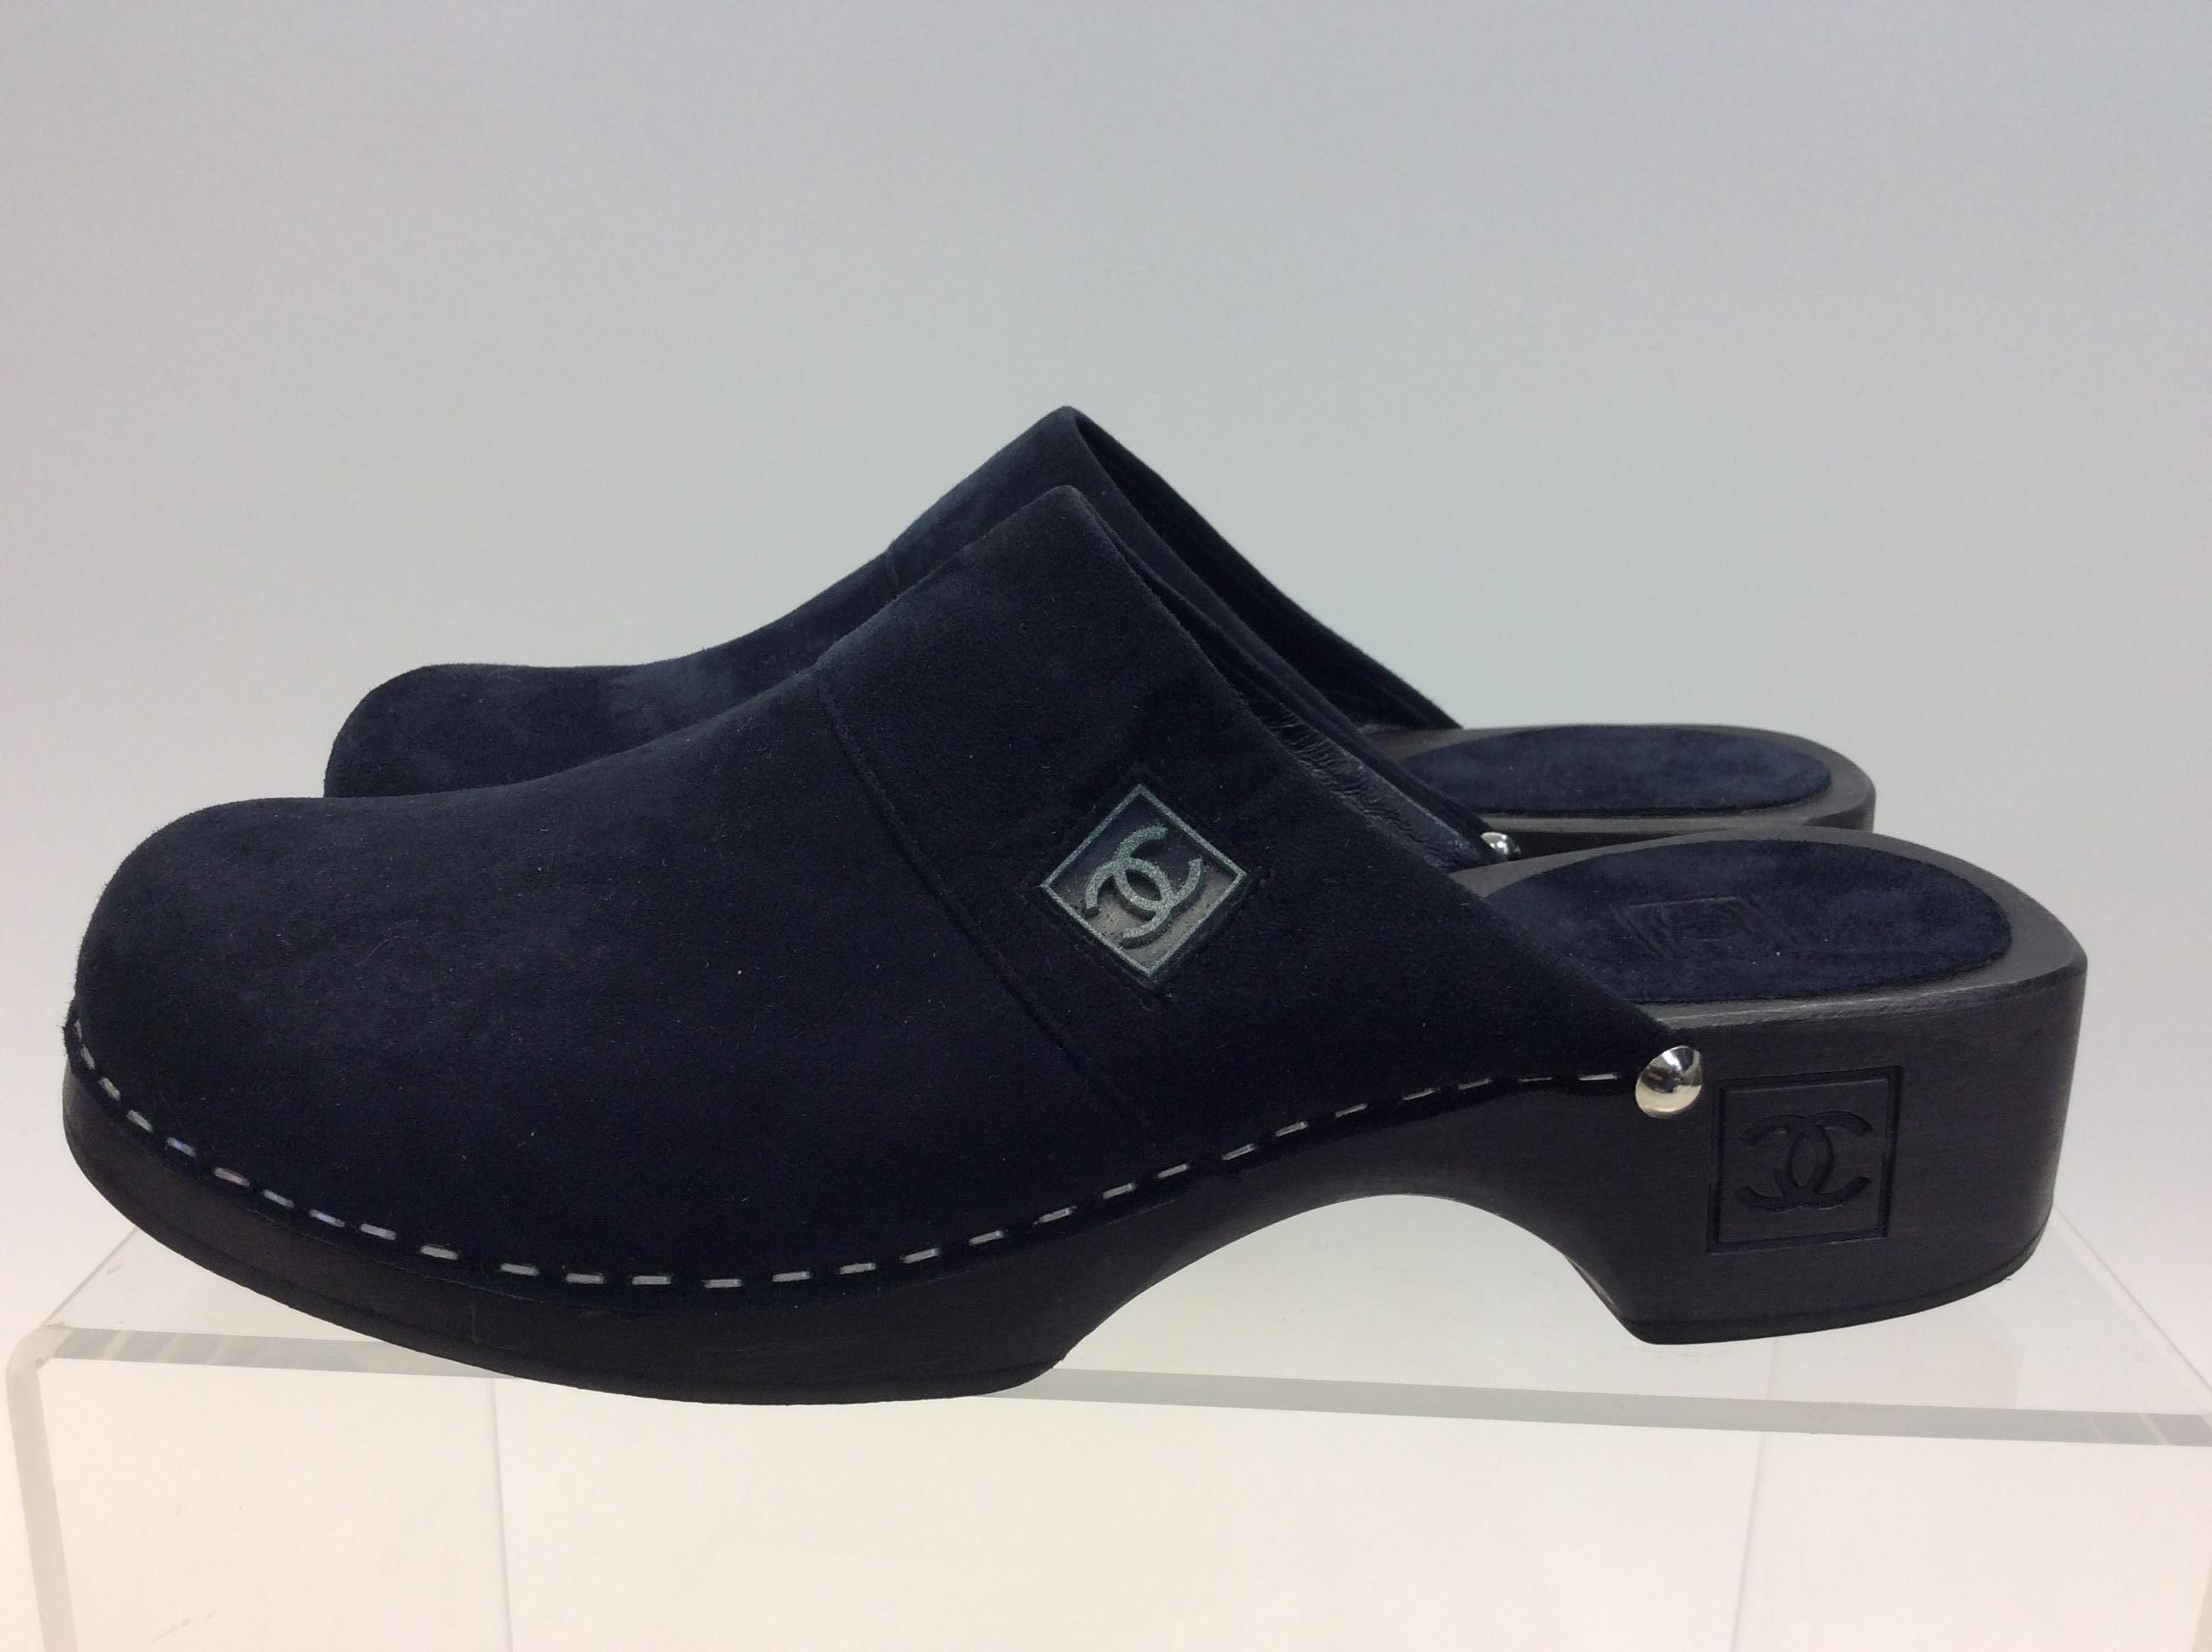 2ec4cd2fd1e Navy Blue Tall Boots - Stlfamilylife